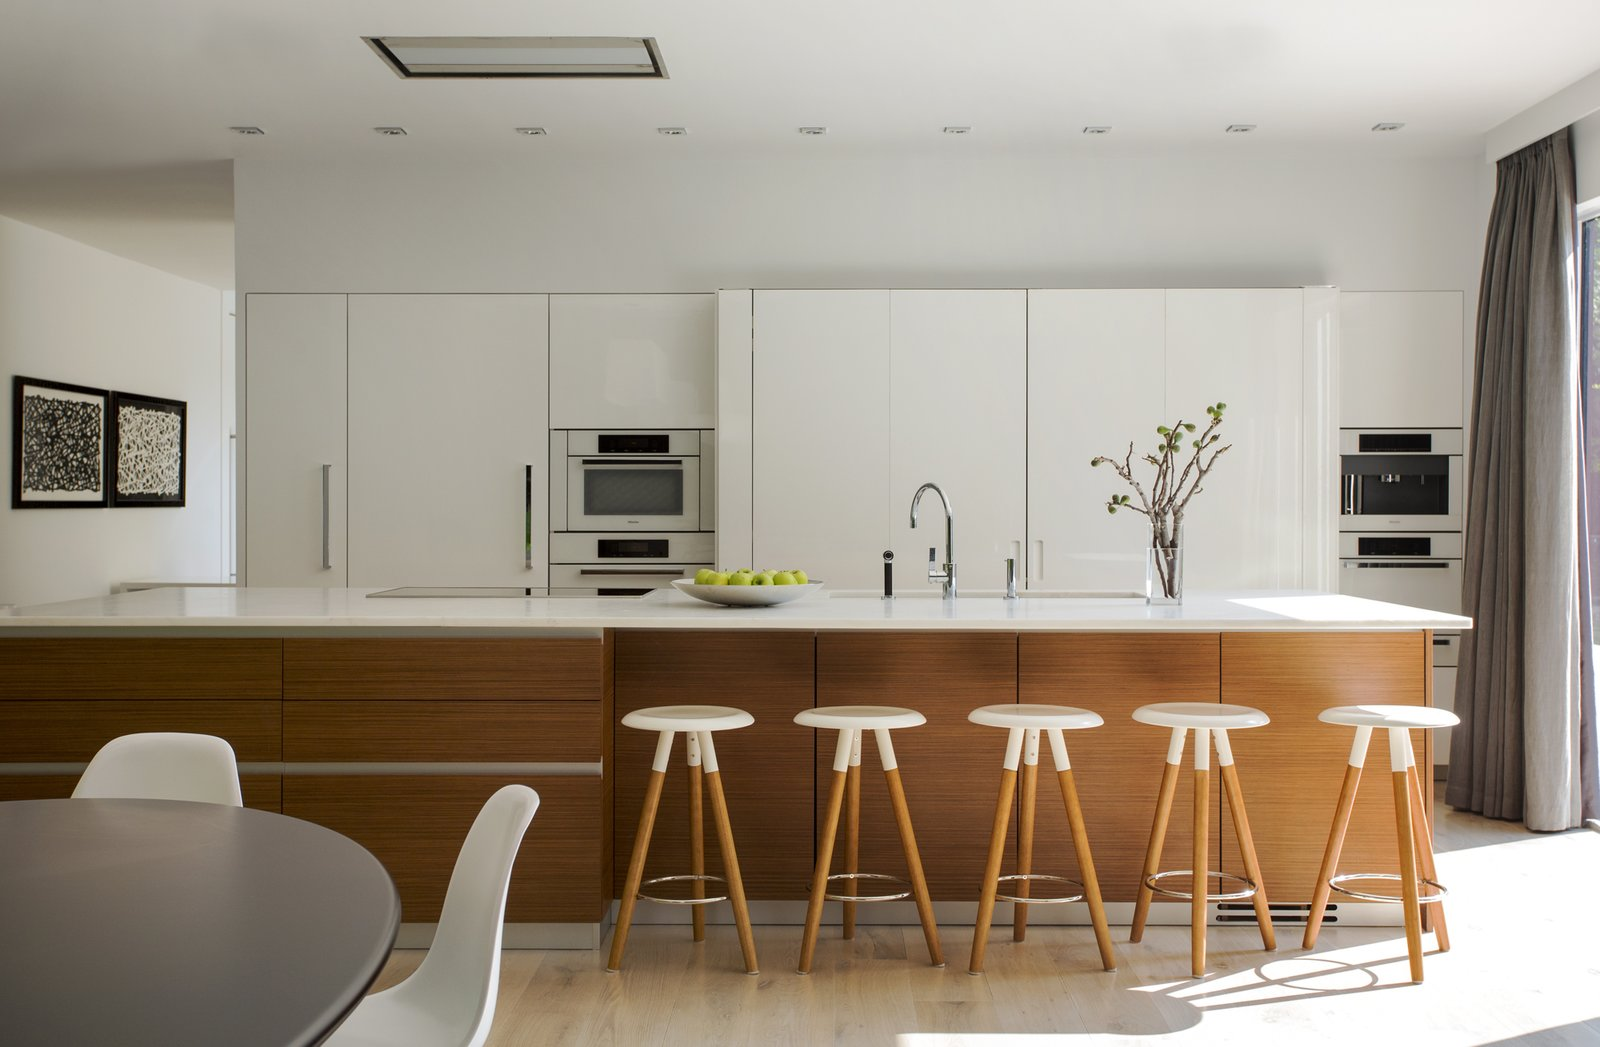 Ledgewood- Kitchen  Ledgewood by LDa  Architecture & Interiors